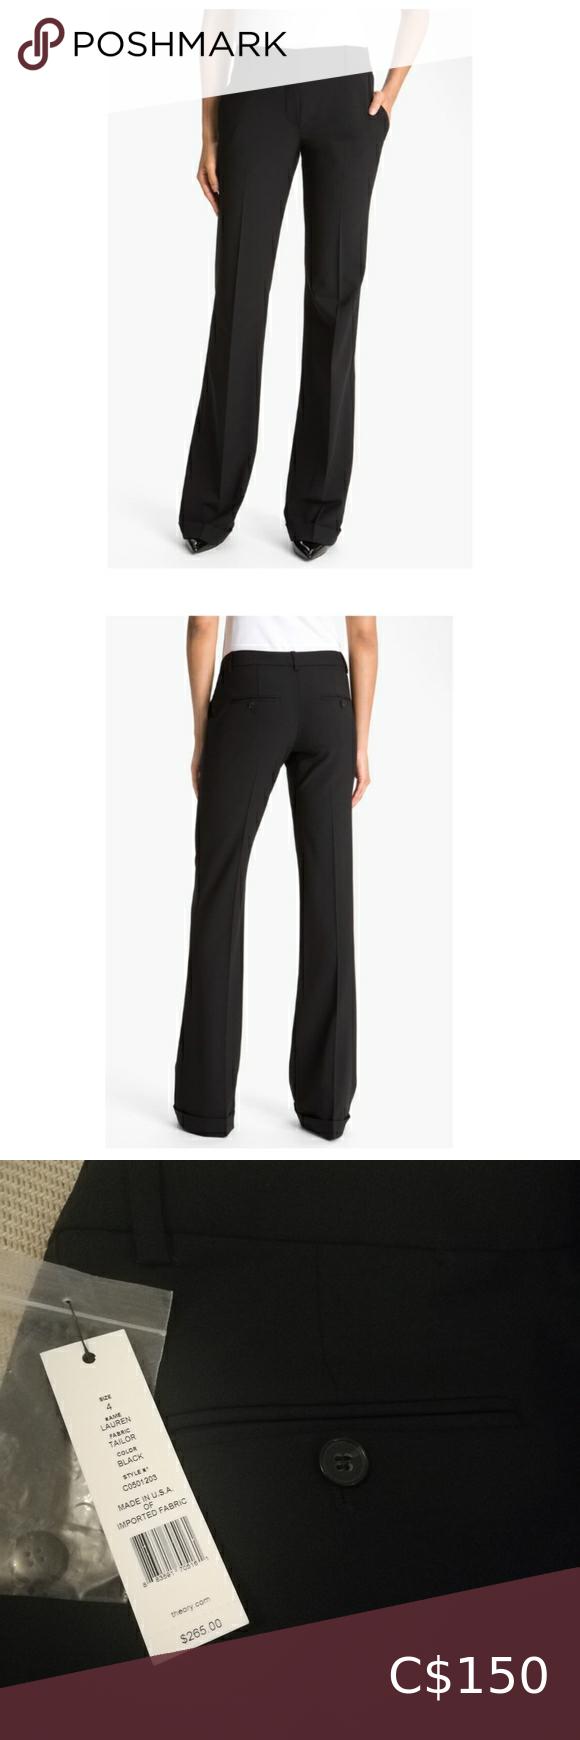 Nwt Theory Lauren Black Dress Work Pants In 2021 Work Pants Pinstripe Dress Pants Flare Dress Pants [ 1740 x 580 Pixel ]